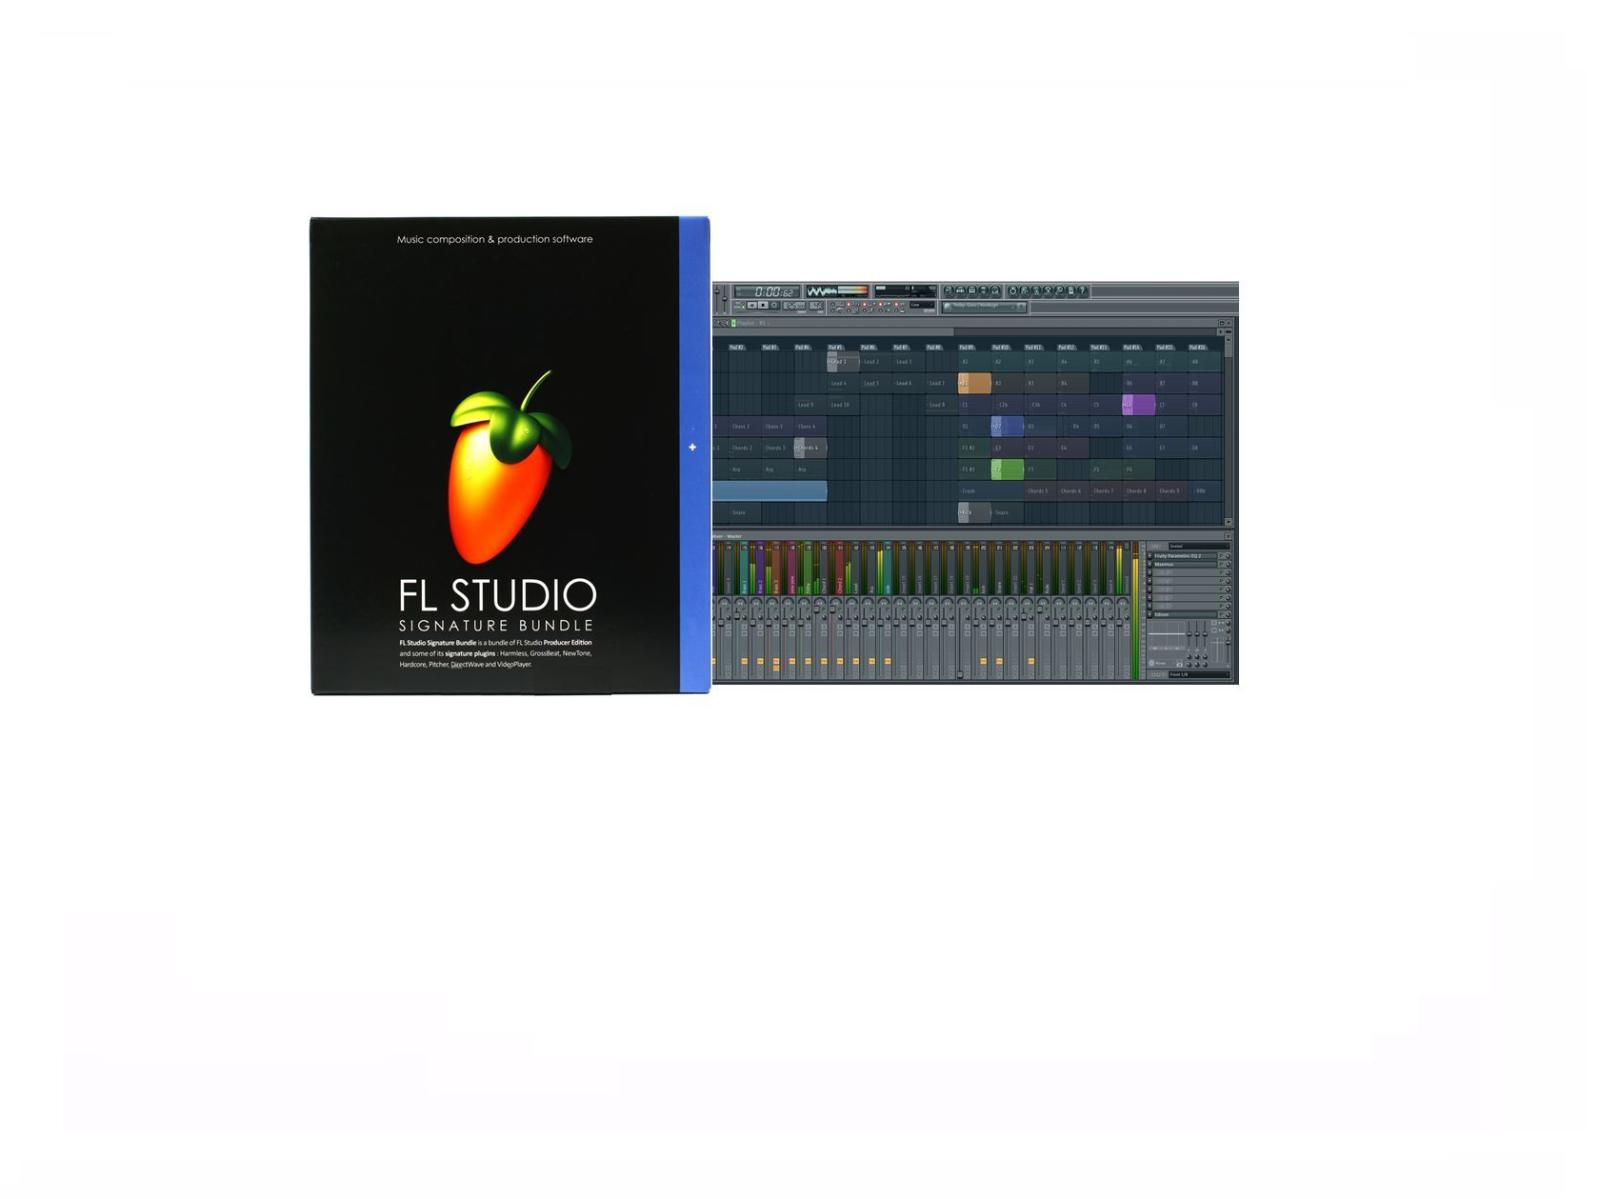 FL STUDIO 20 FRUITY LOOPS SIGNATURE MUSIC SOFTWARE RETAIL MAC LICENSE El Capitan